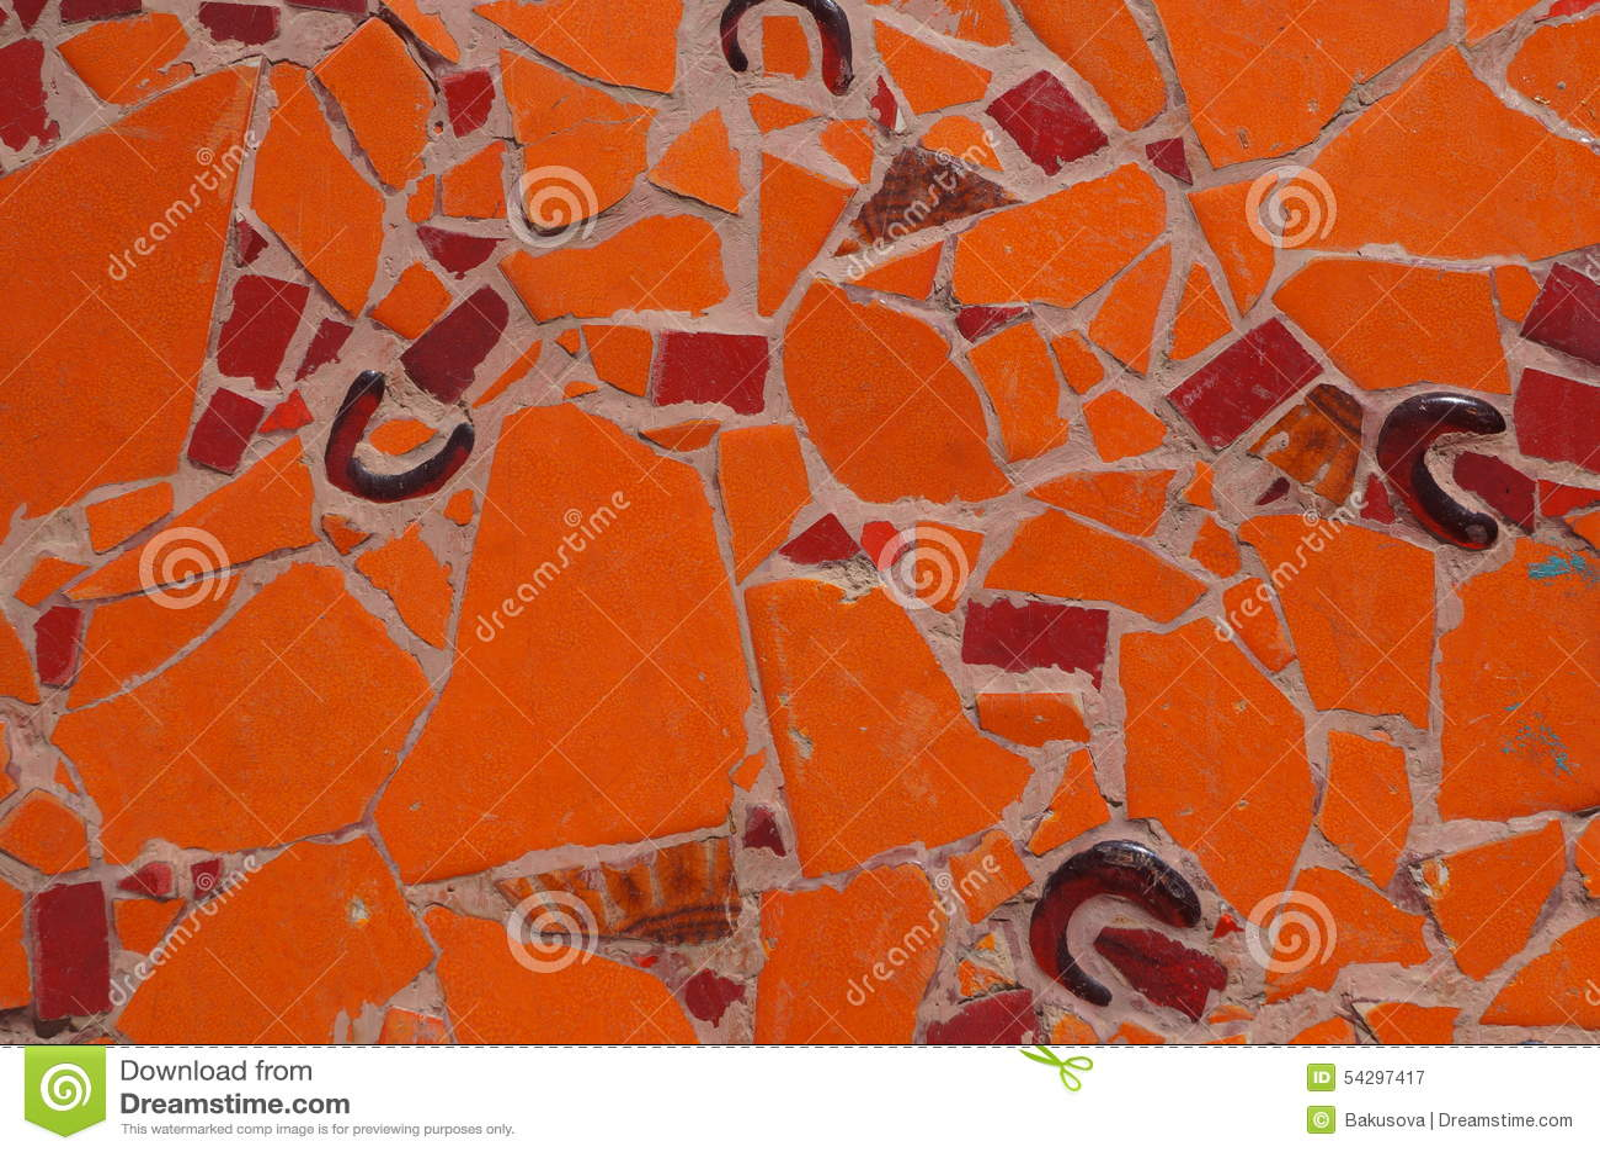 Sandstone Repeating Texture